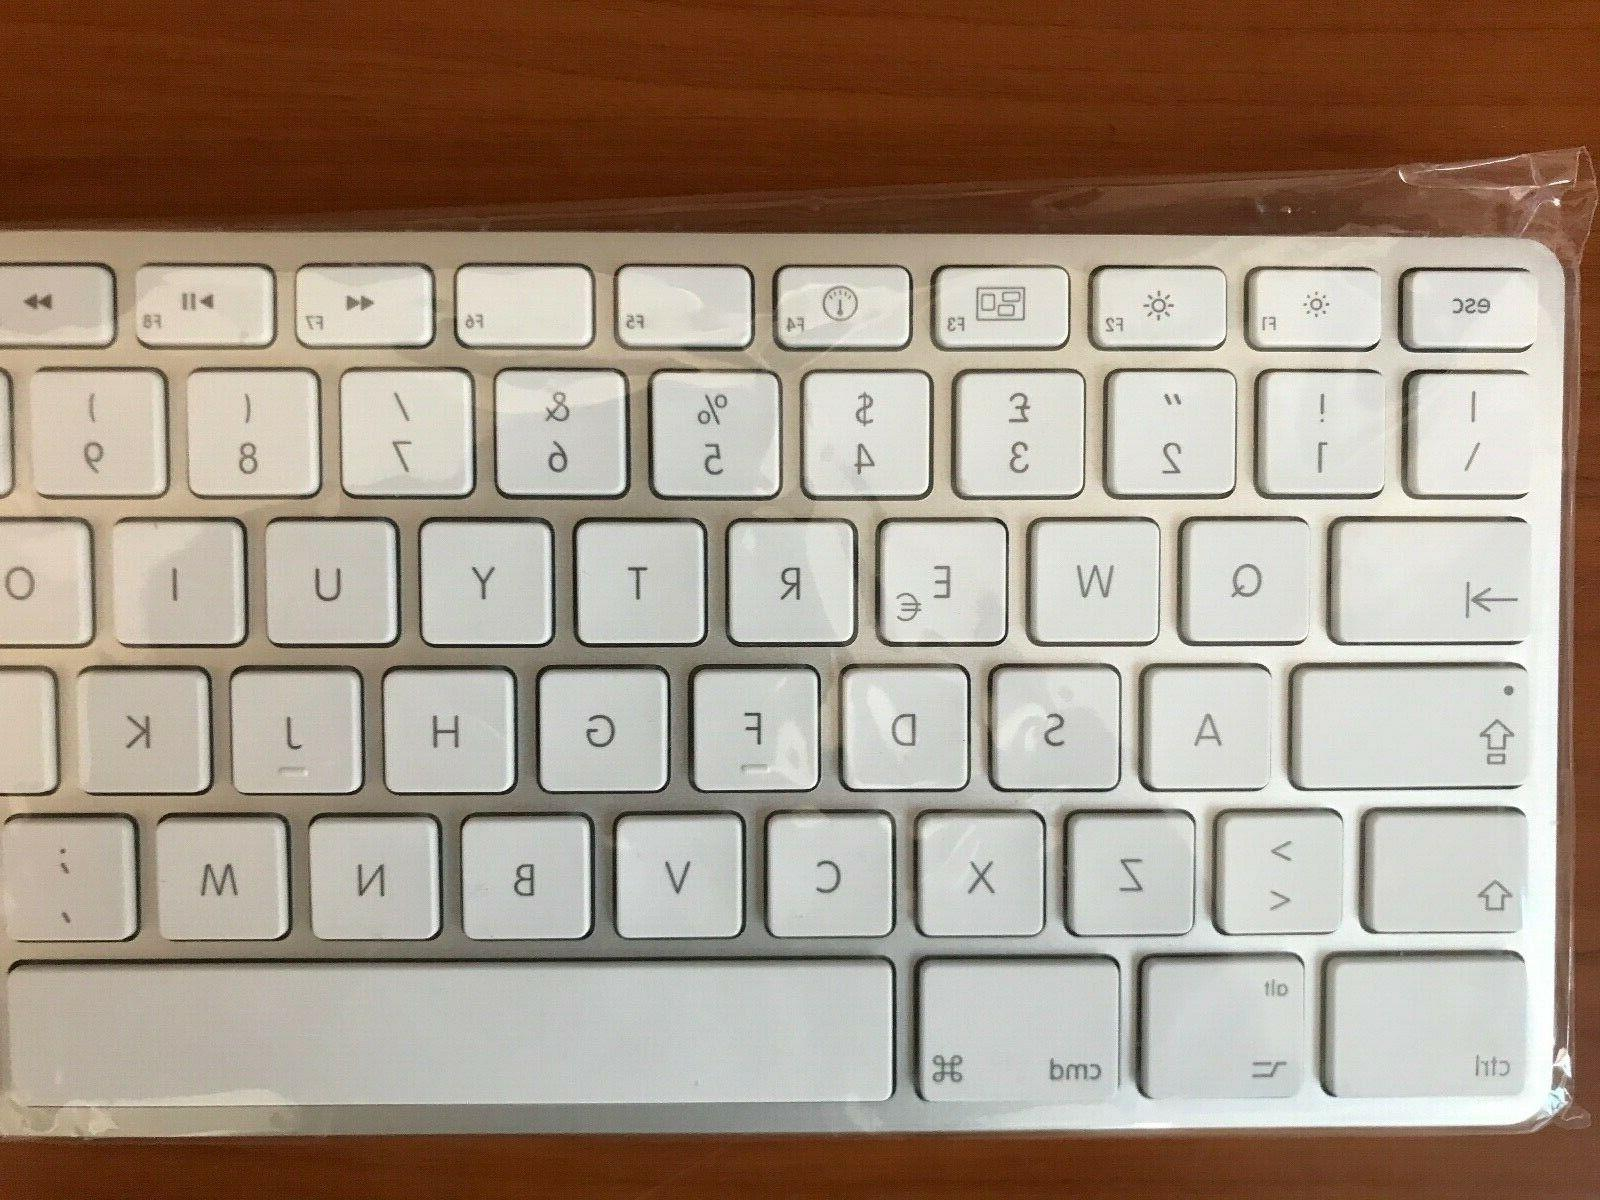 New Wired Keyboard - Italian Version